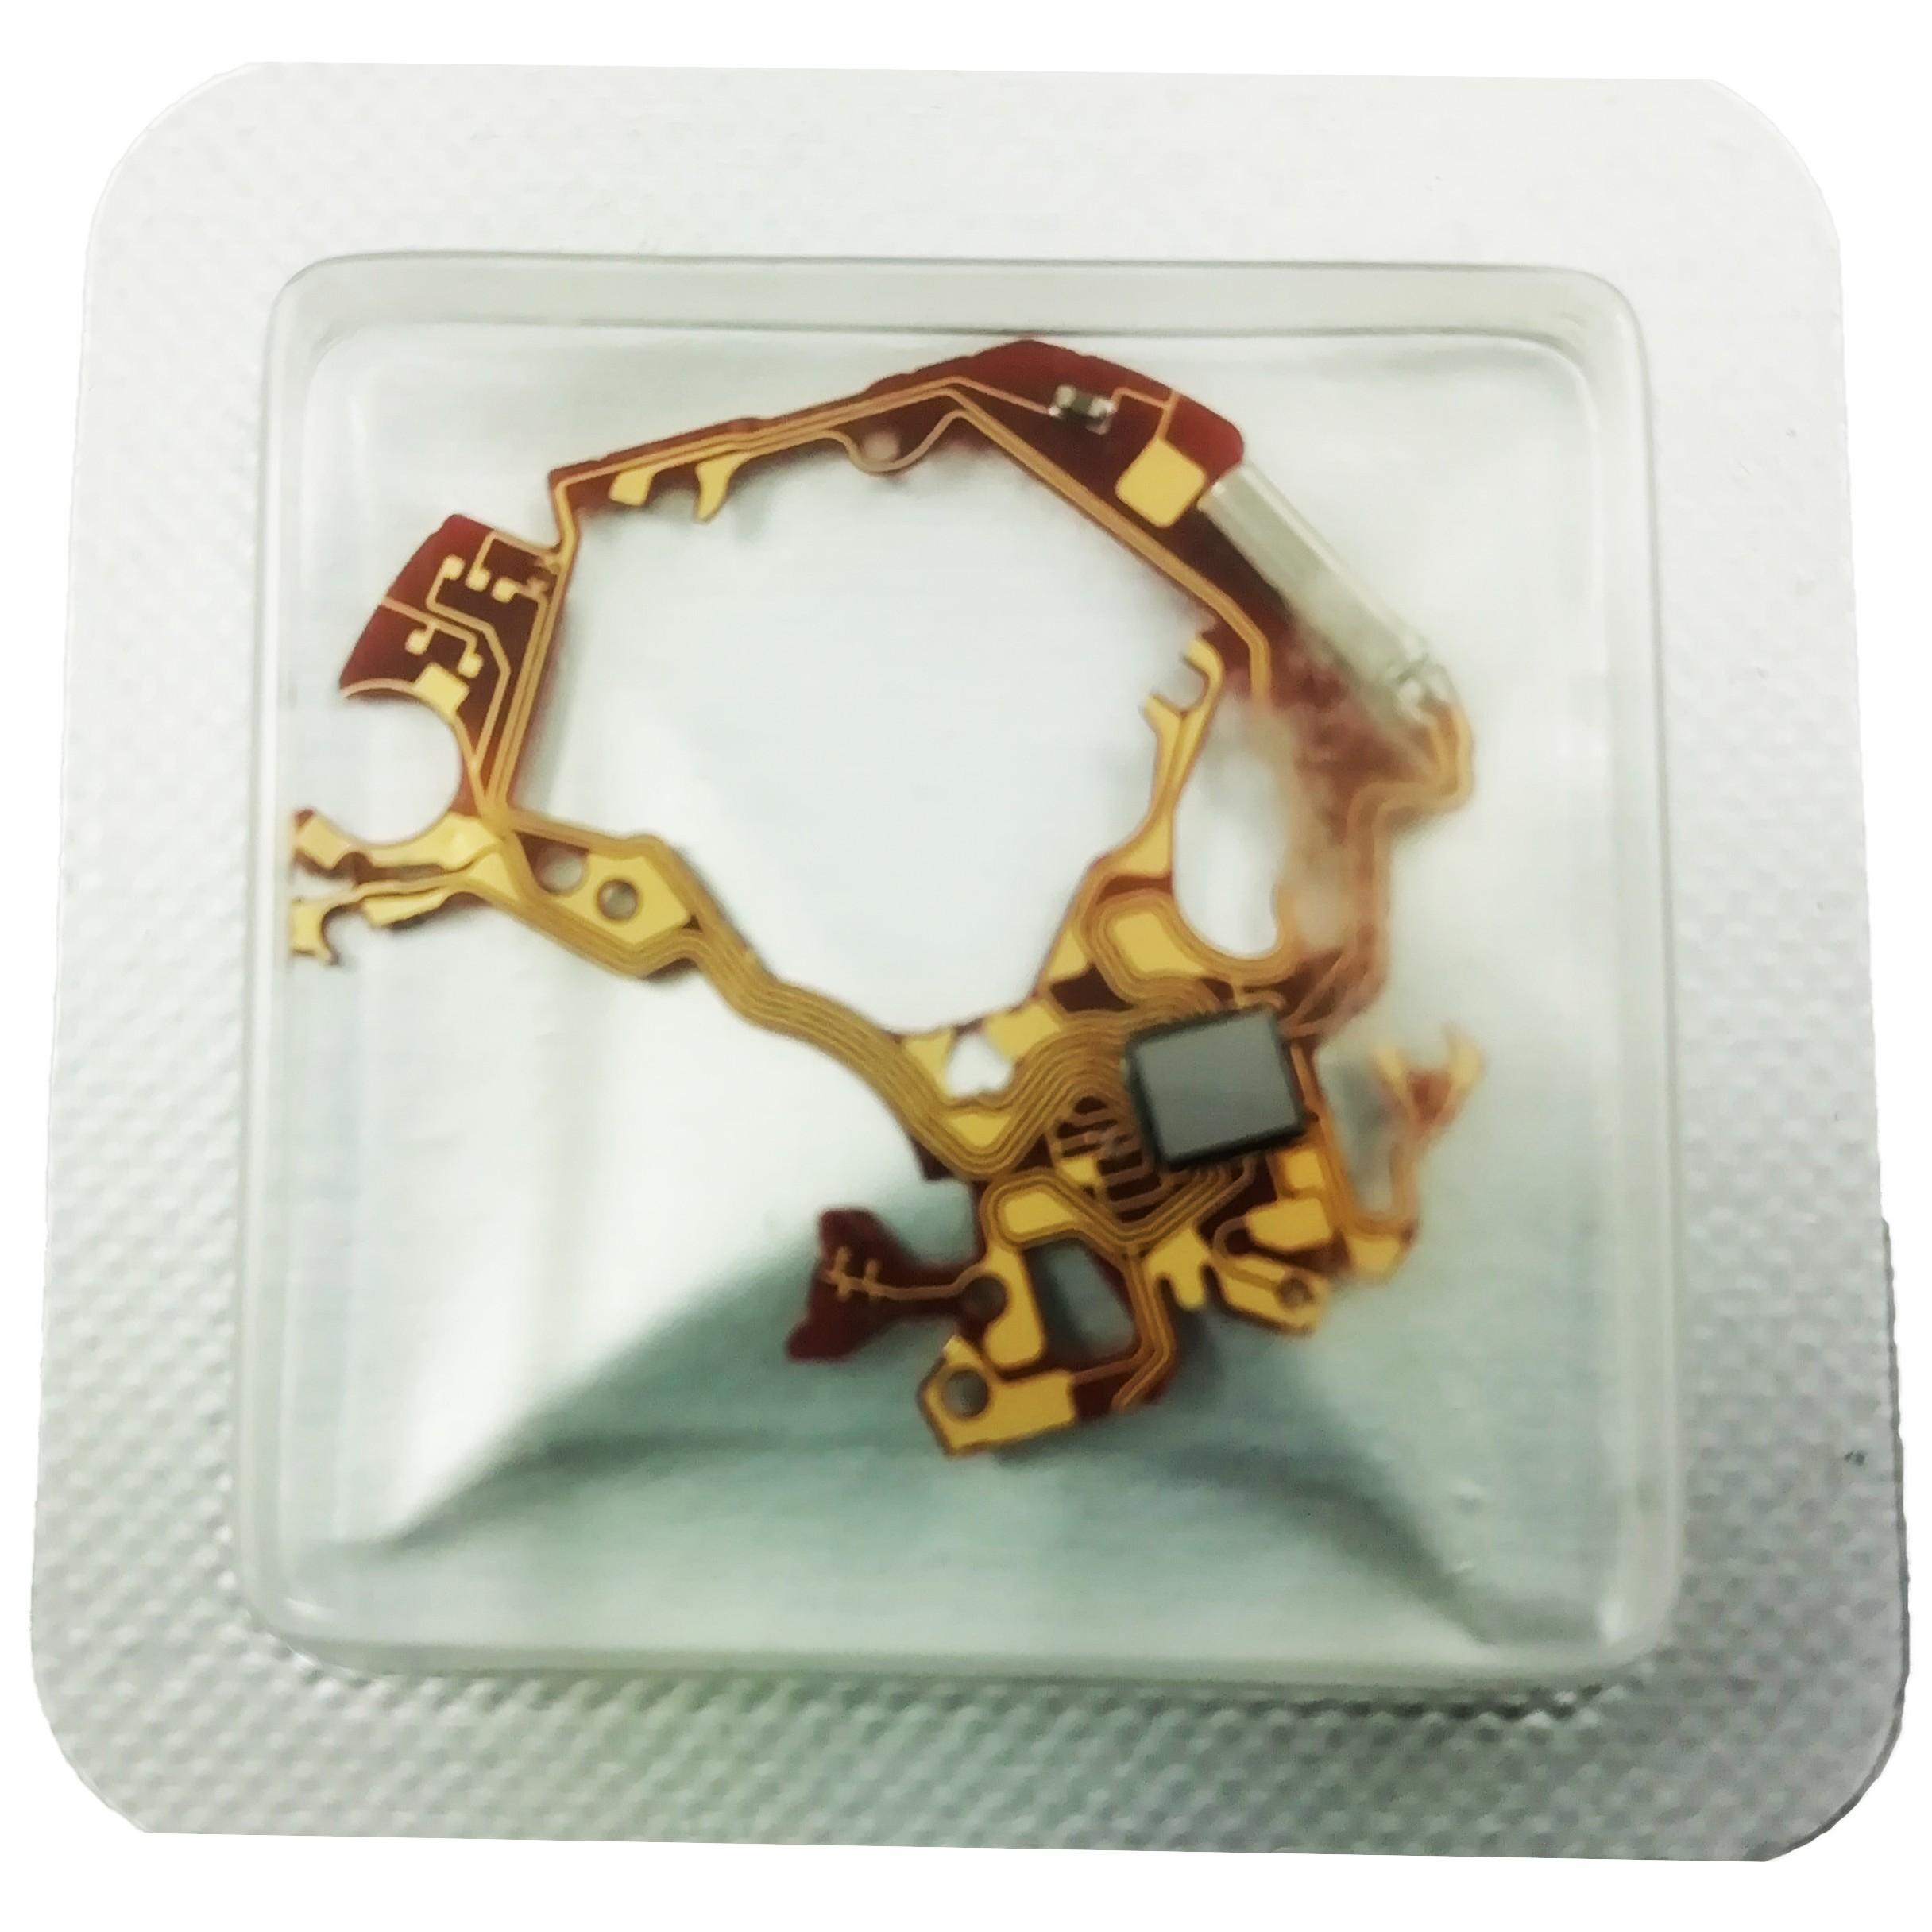 Circuit Mecanism Ceas Seiko Ym92 Series